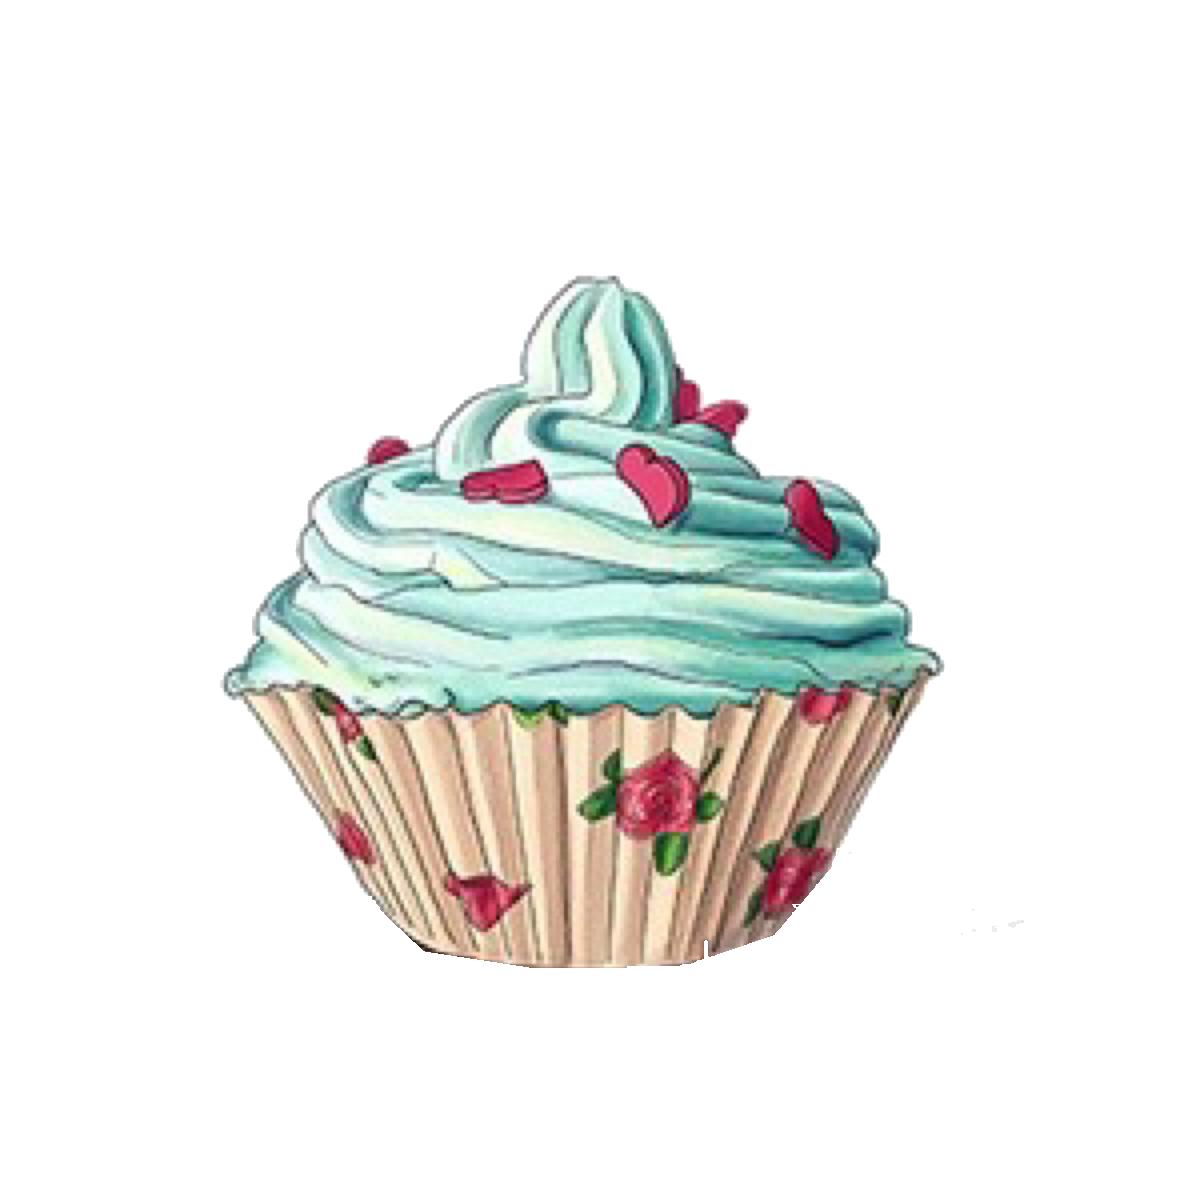 png transparent Baking drawing cupcake. Muffin birthday cake bakery